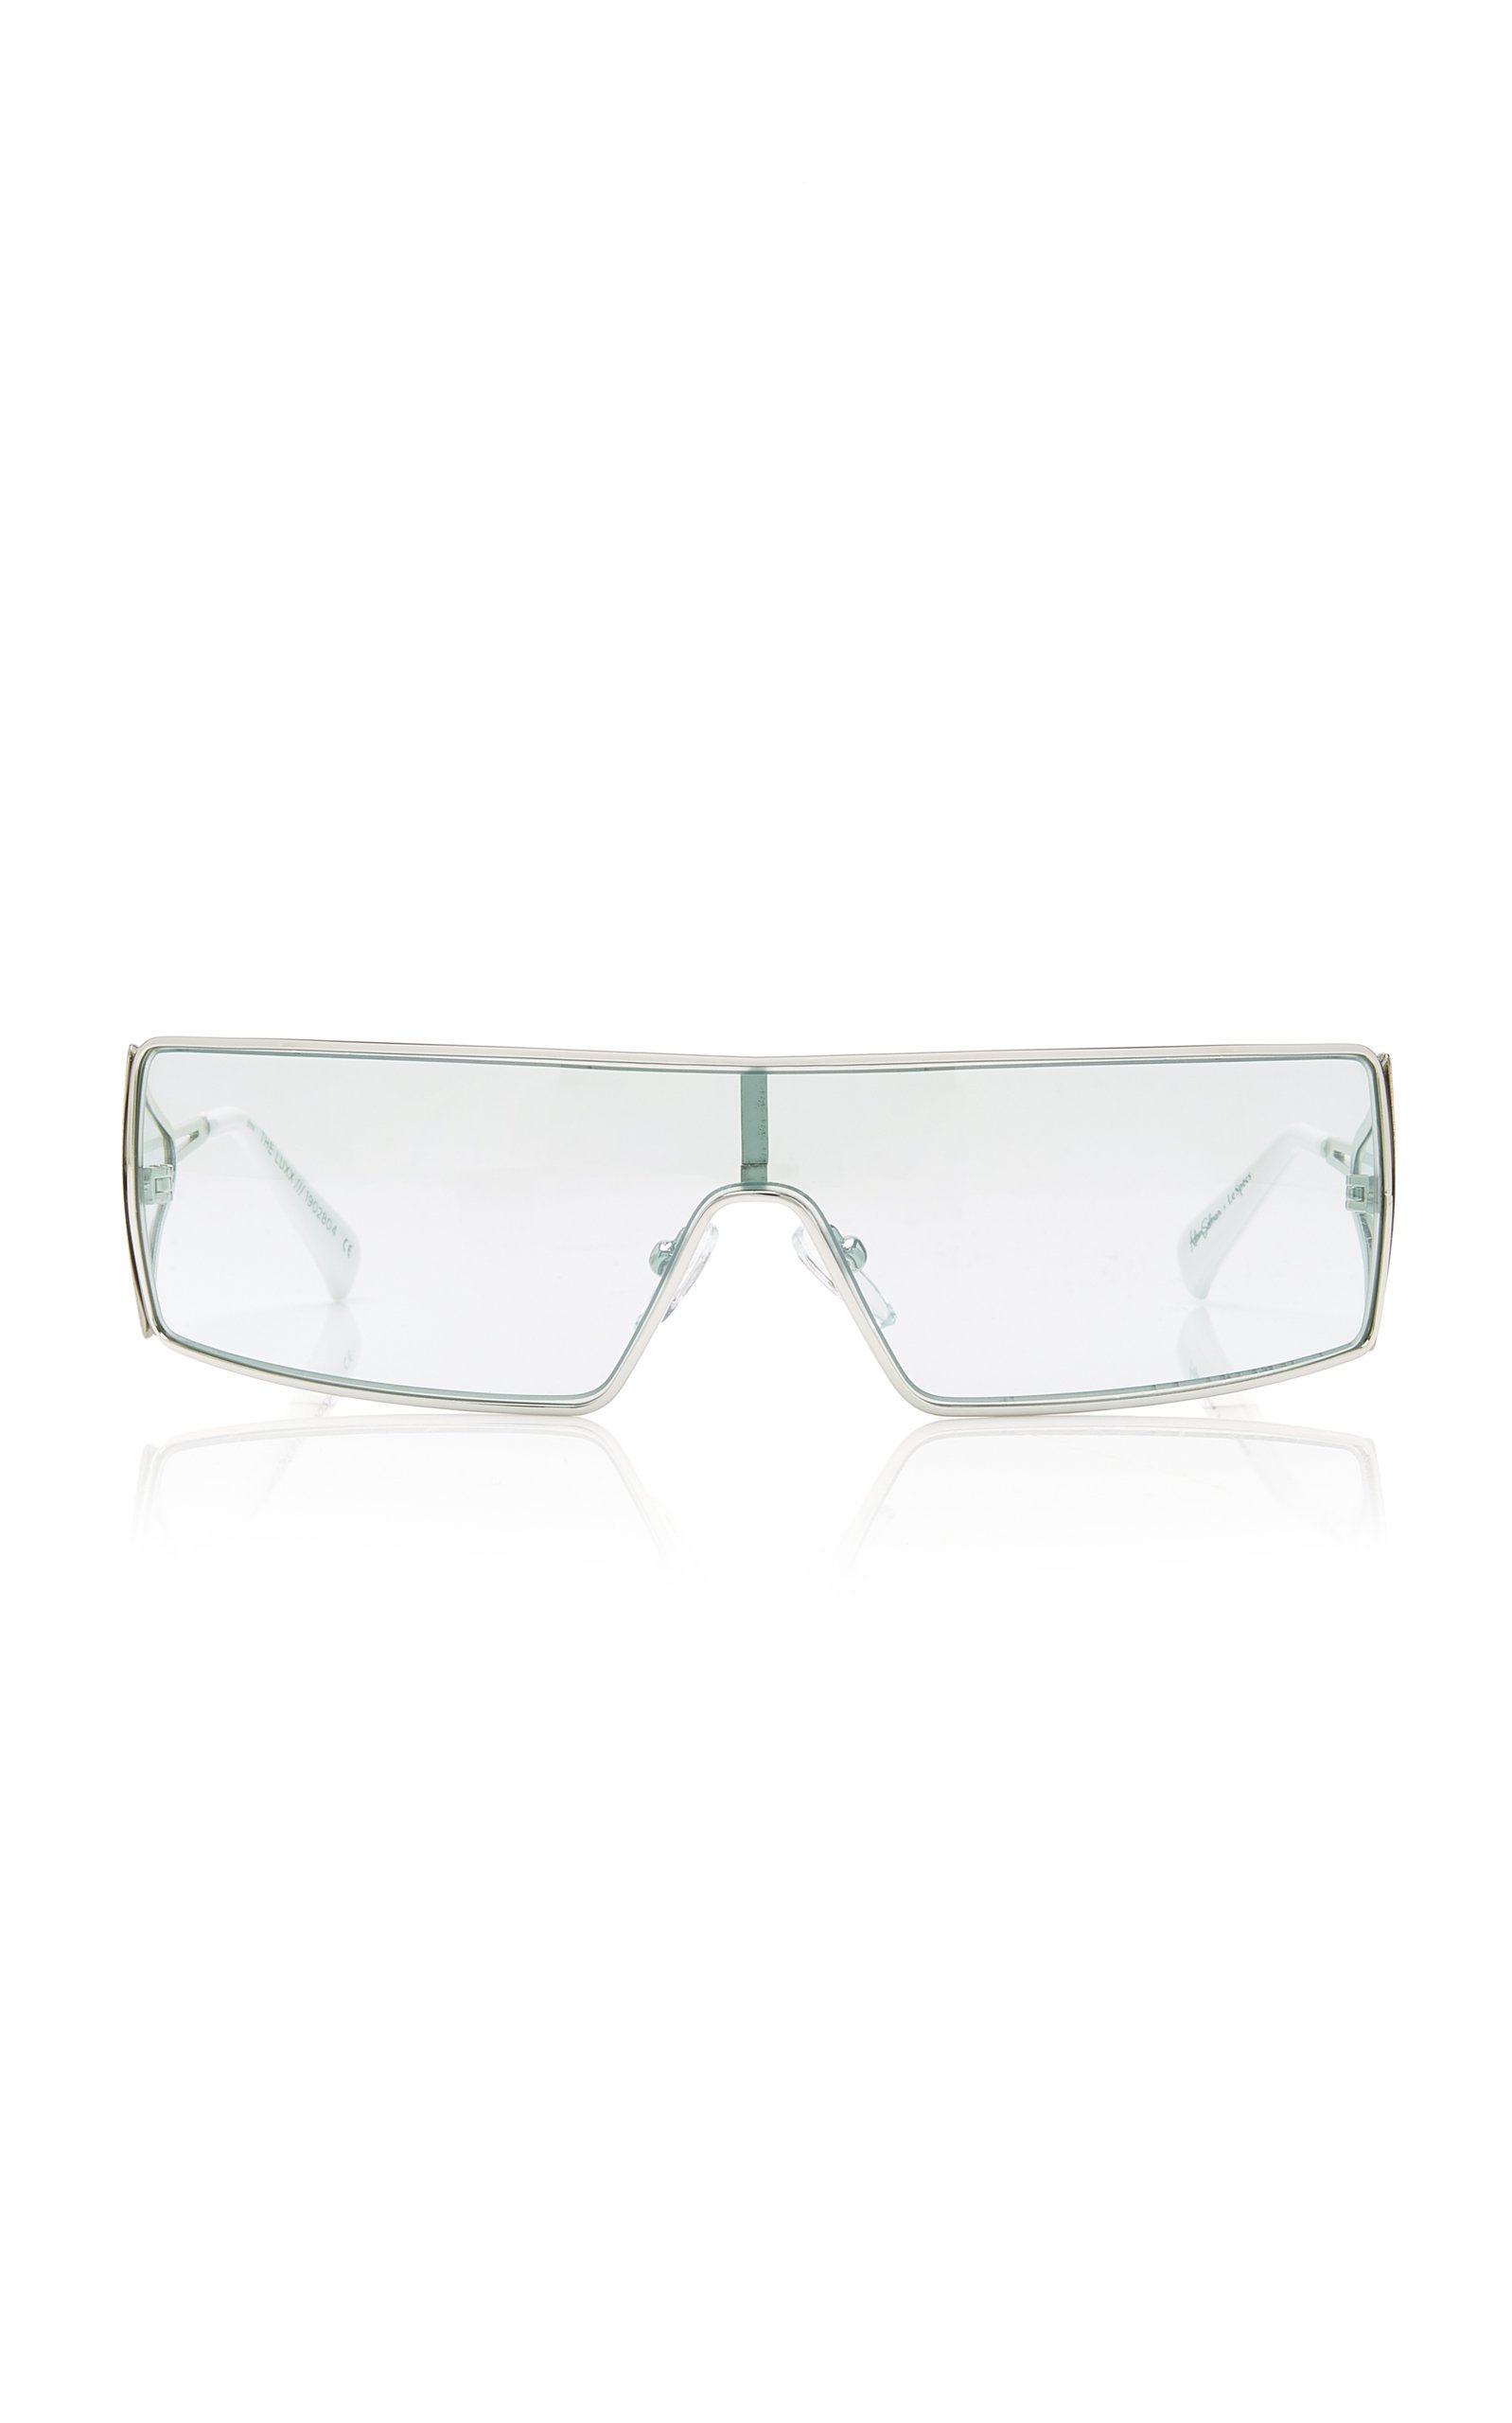 Adam Selman X Le Specs The Luxx Metal Square-Frame Sunglasses